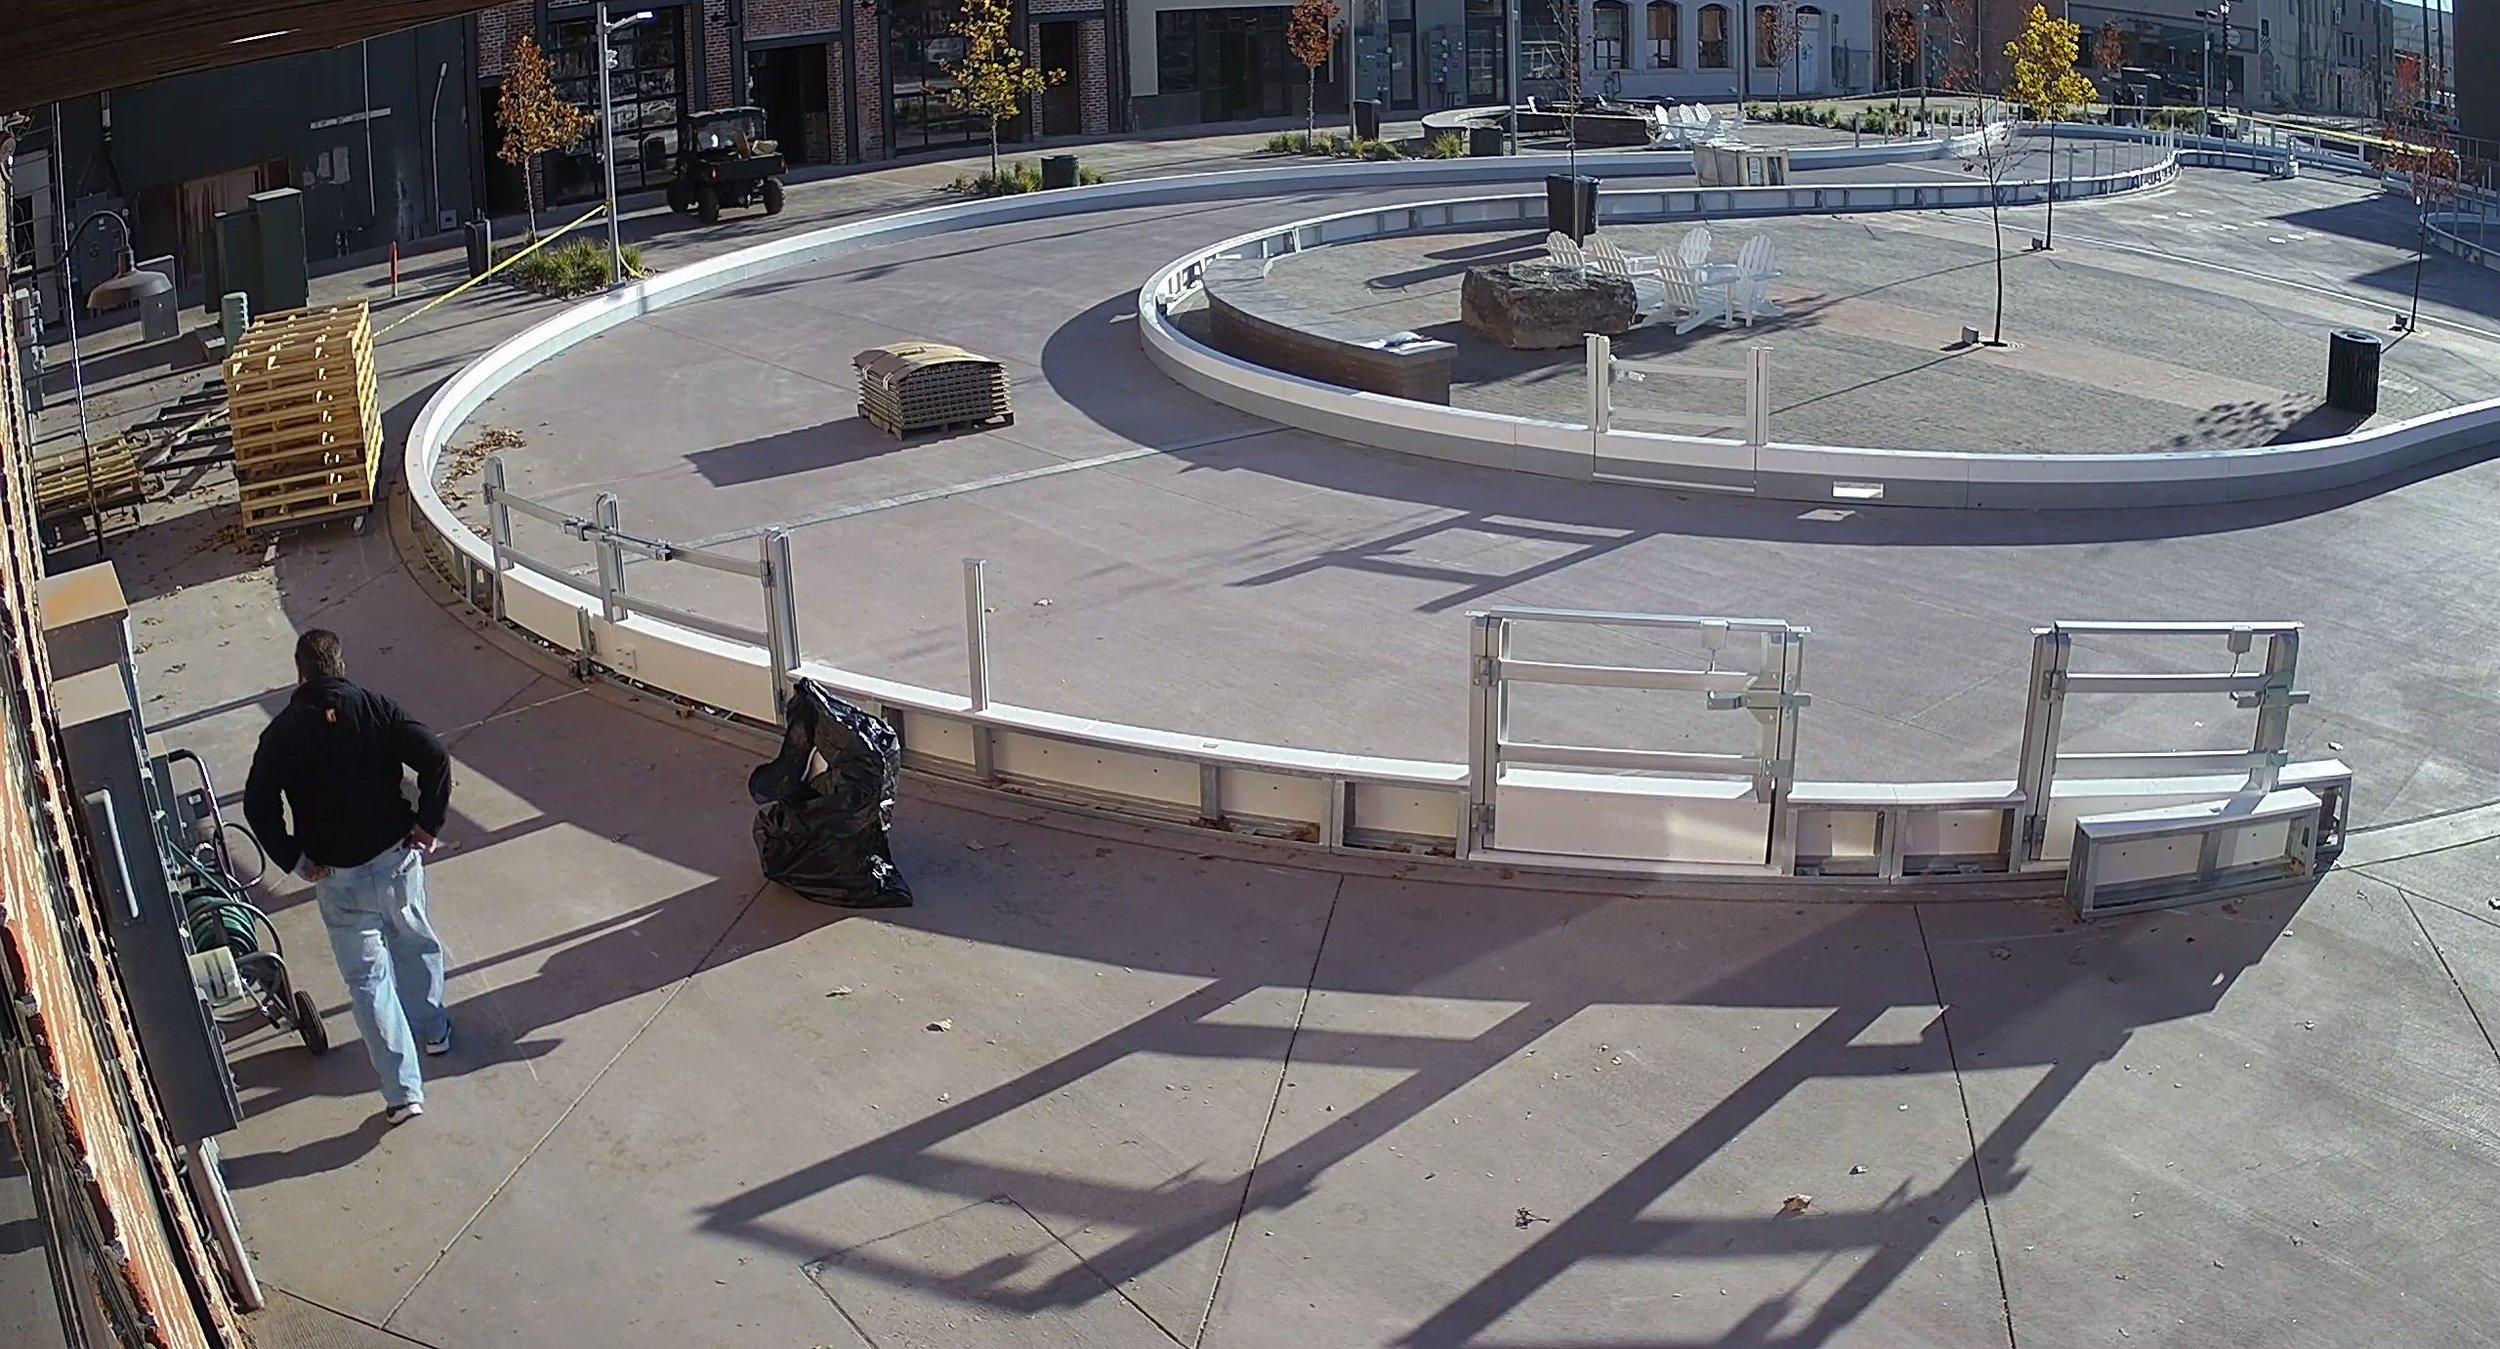 Plaza camera_IP Camera22_Plaza camera_20181030100818_4434156.jpg